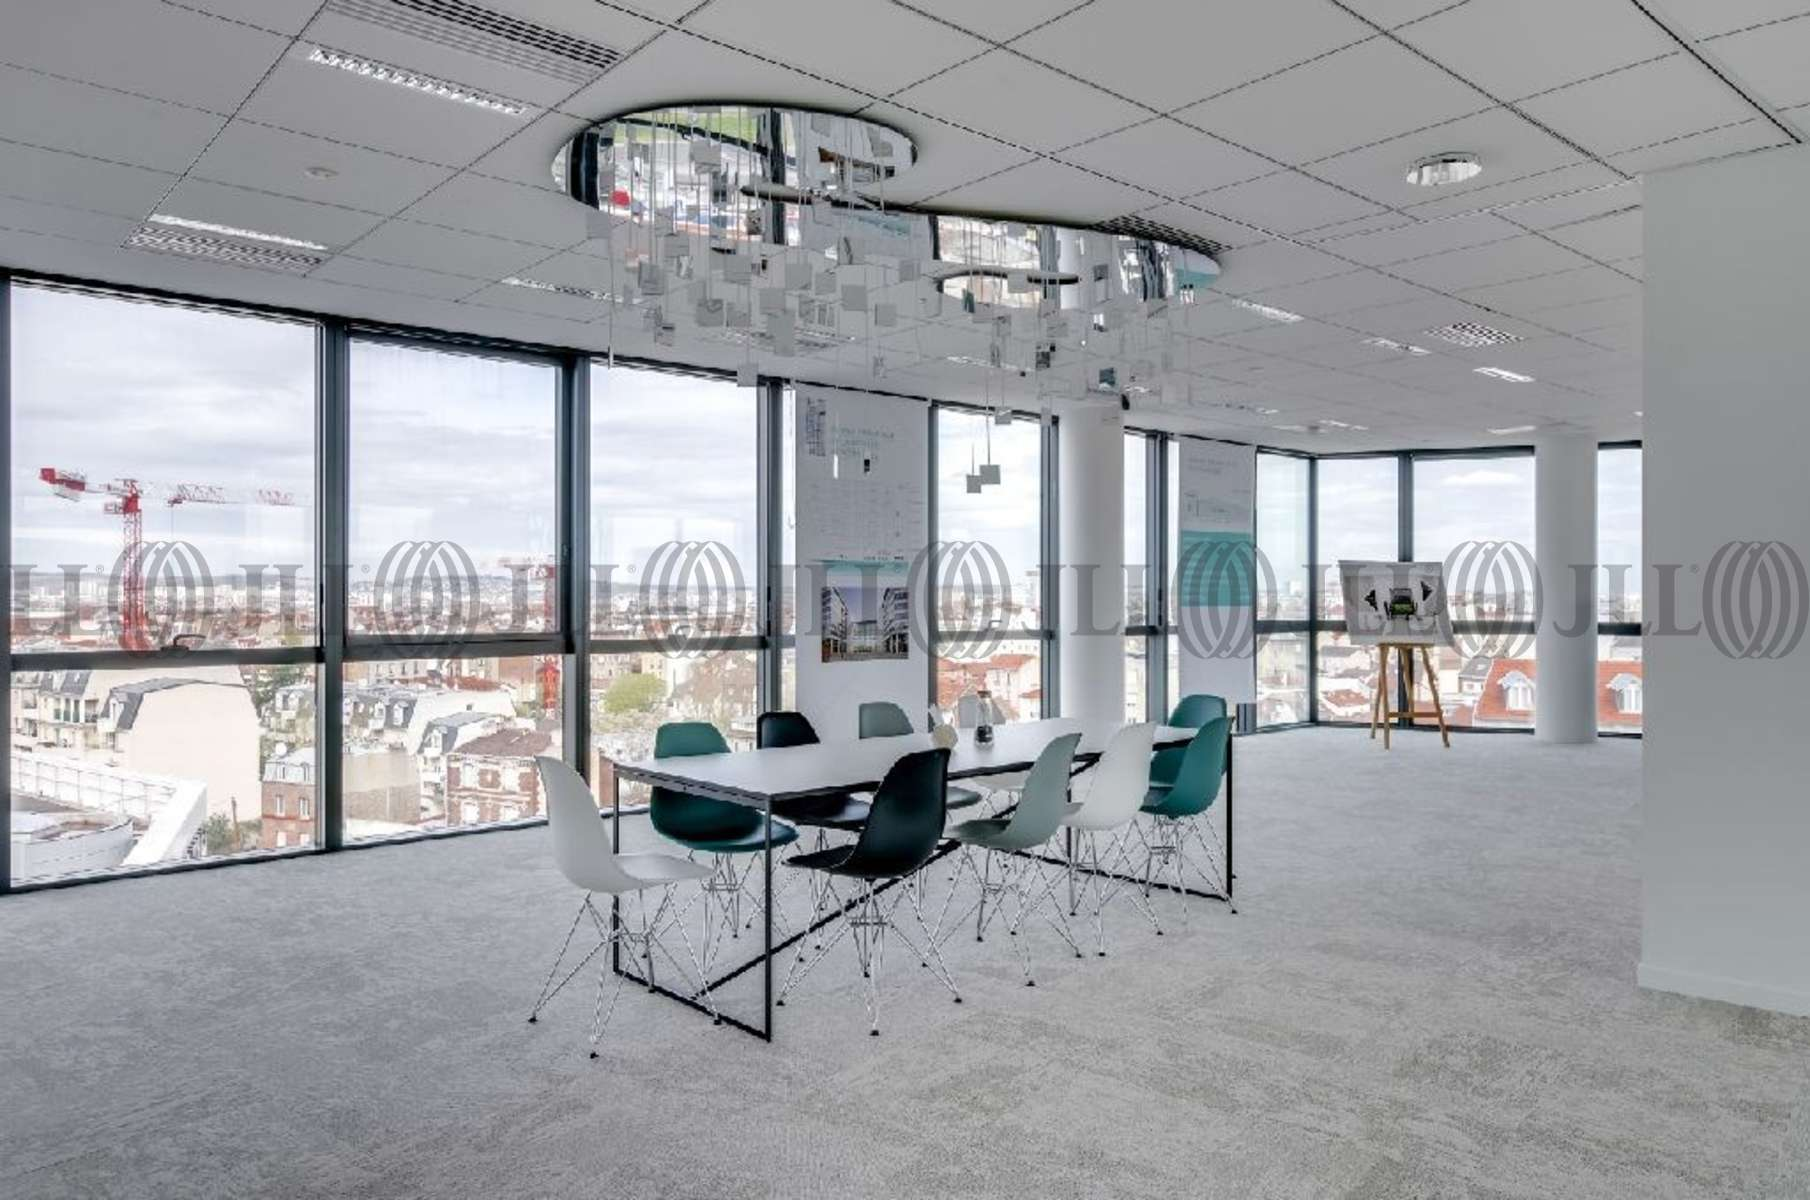 Trame de bureaux immeuble de bureaux moderne rebecca image stock